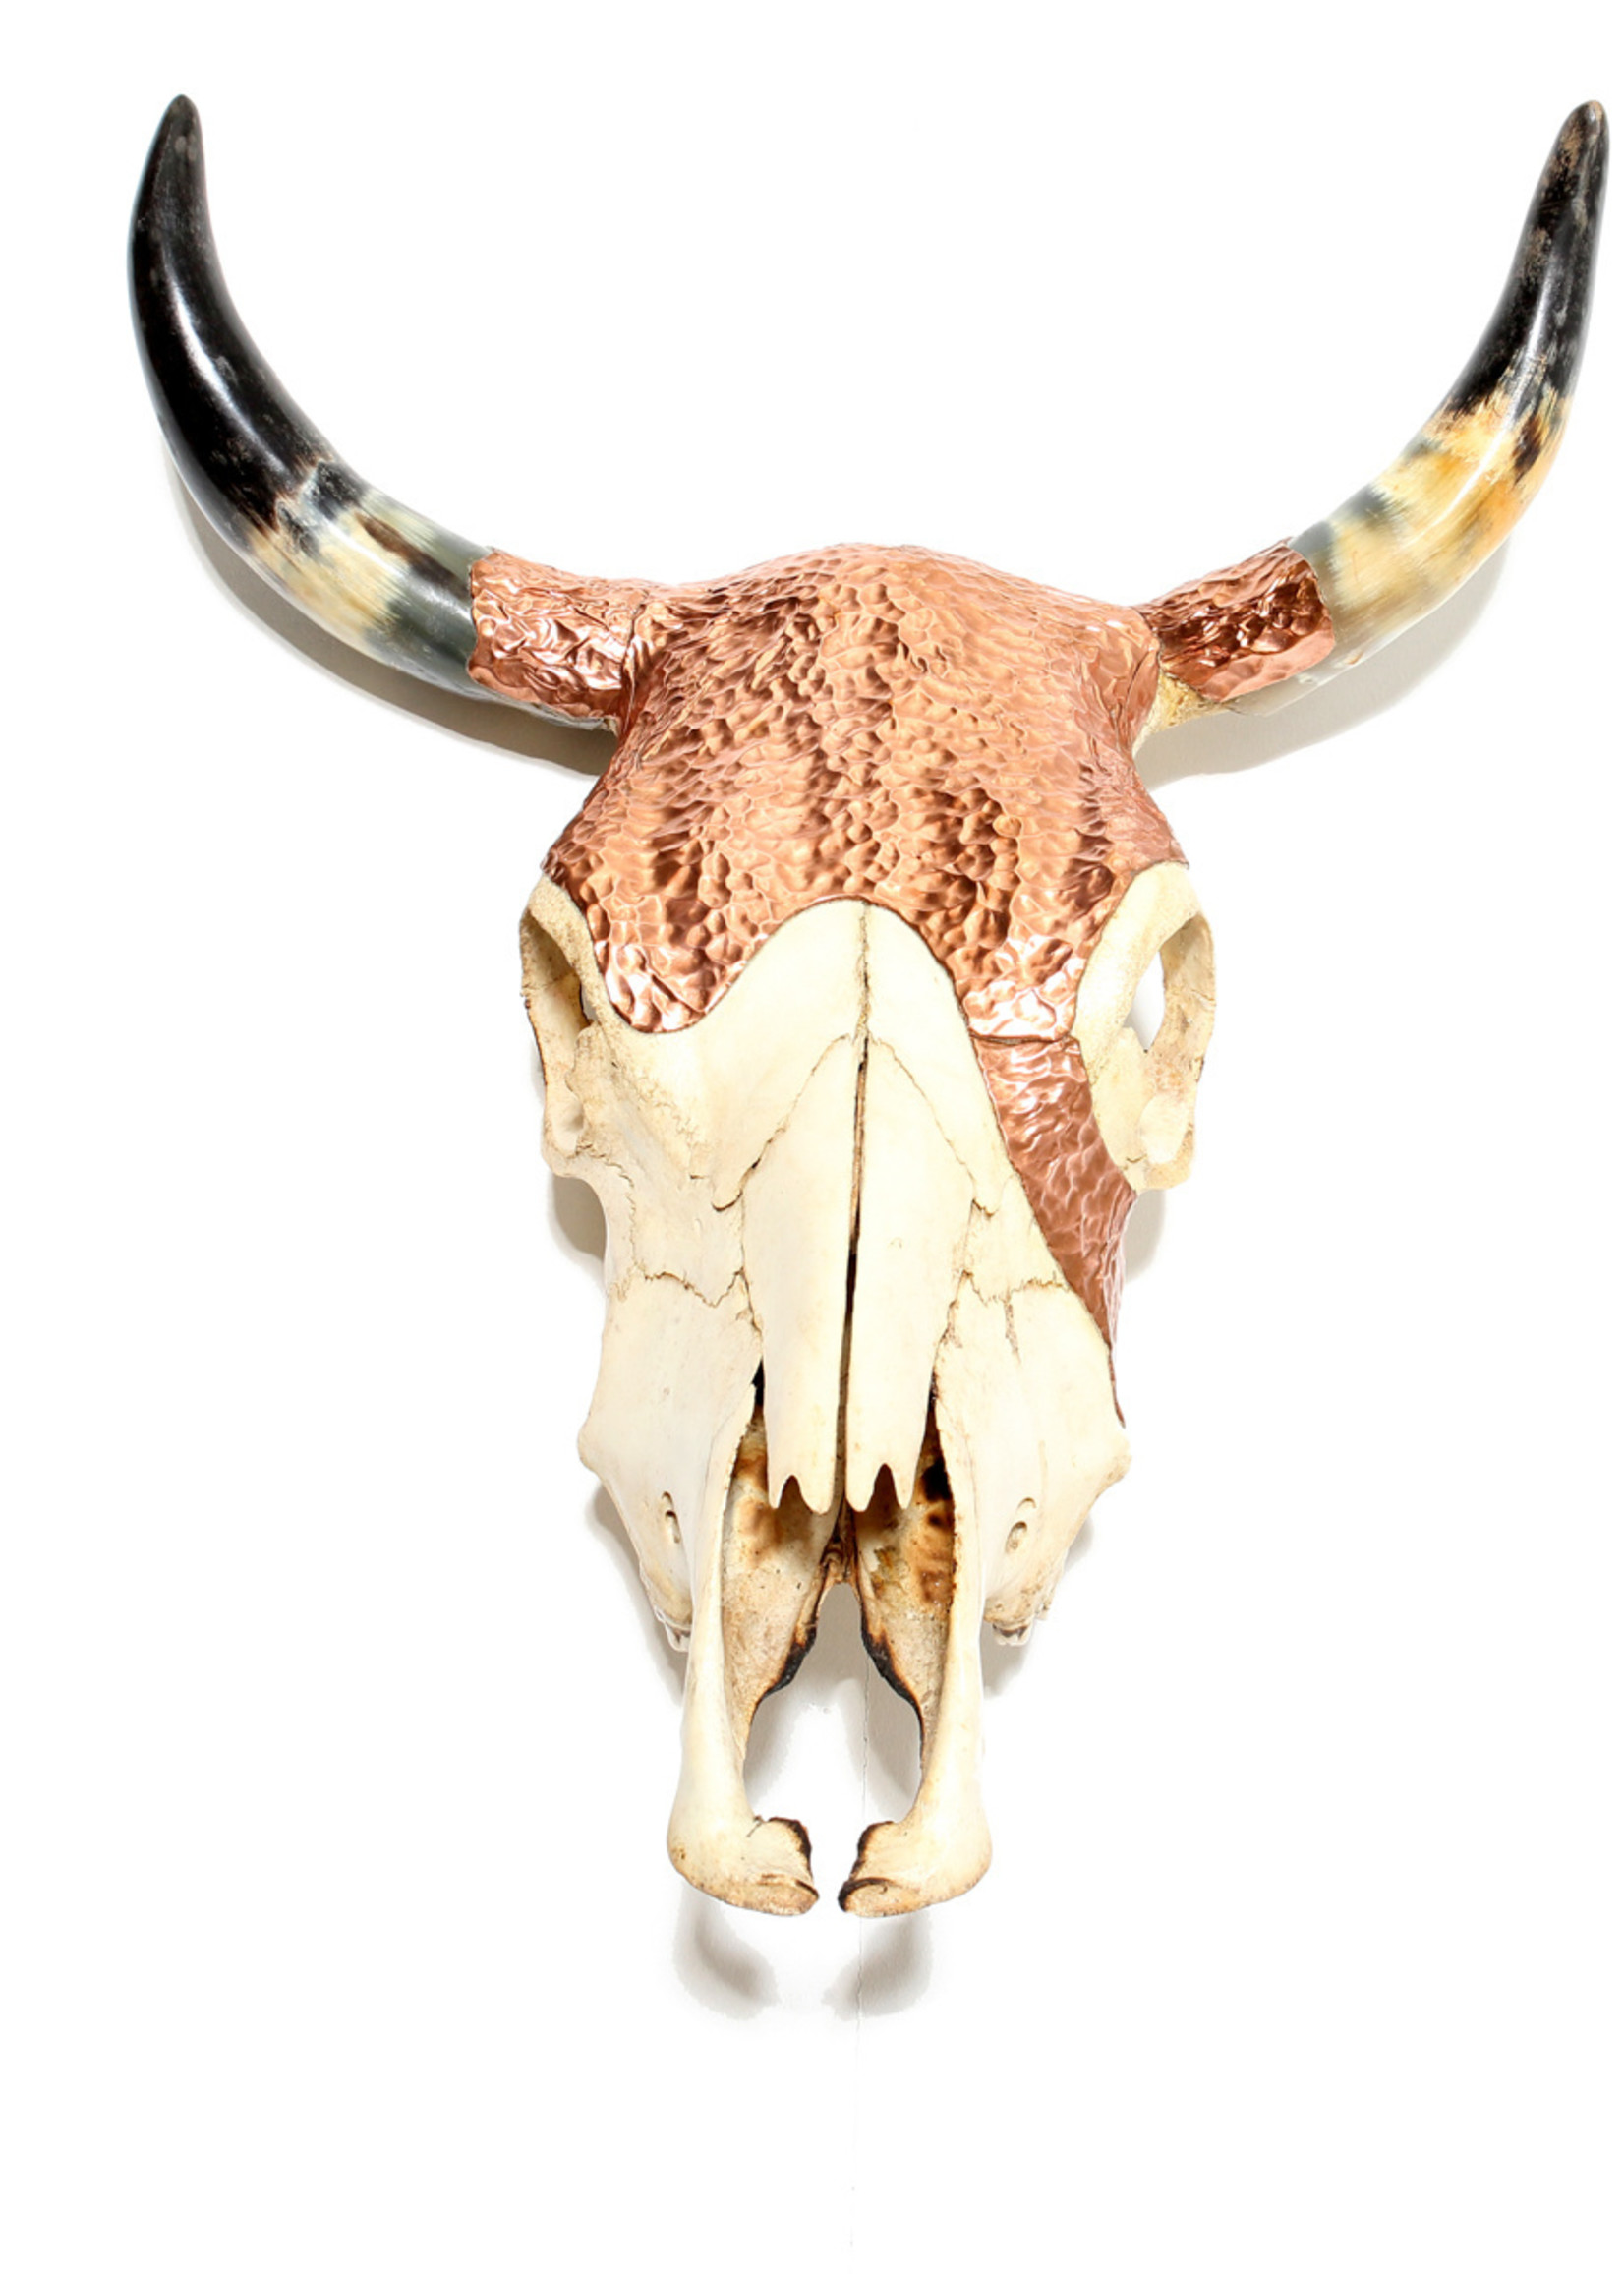 The Copper Skull